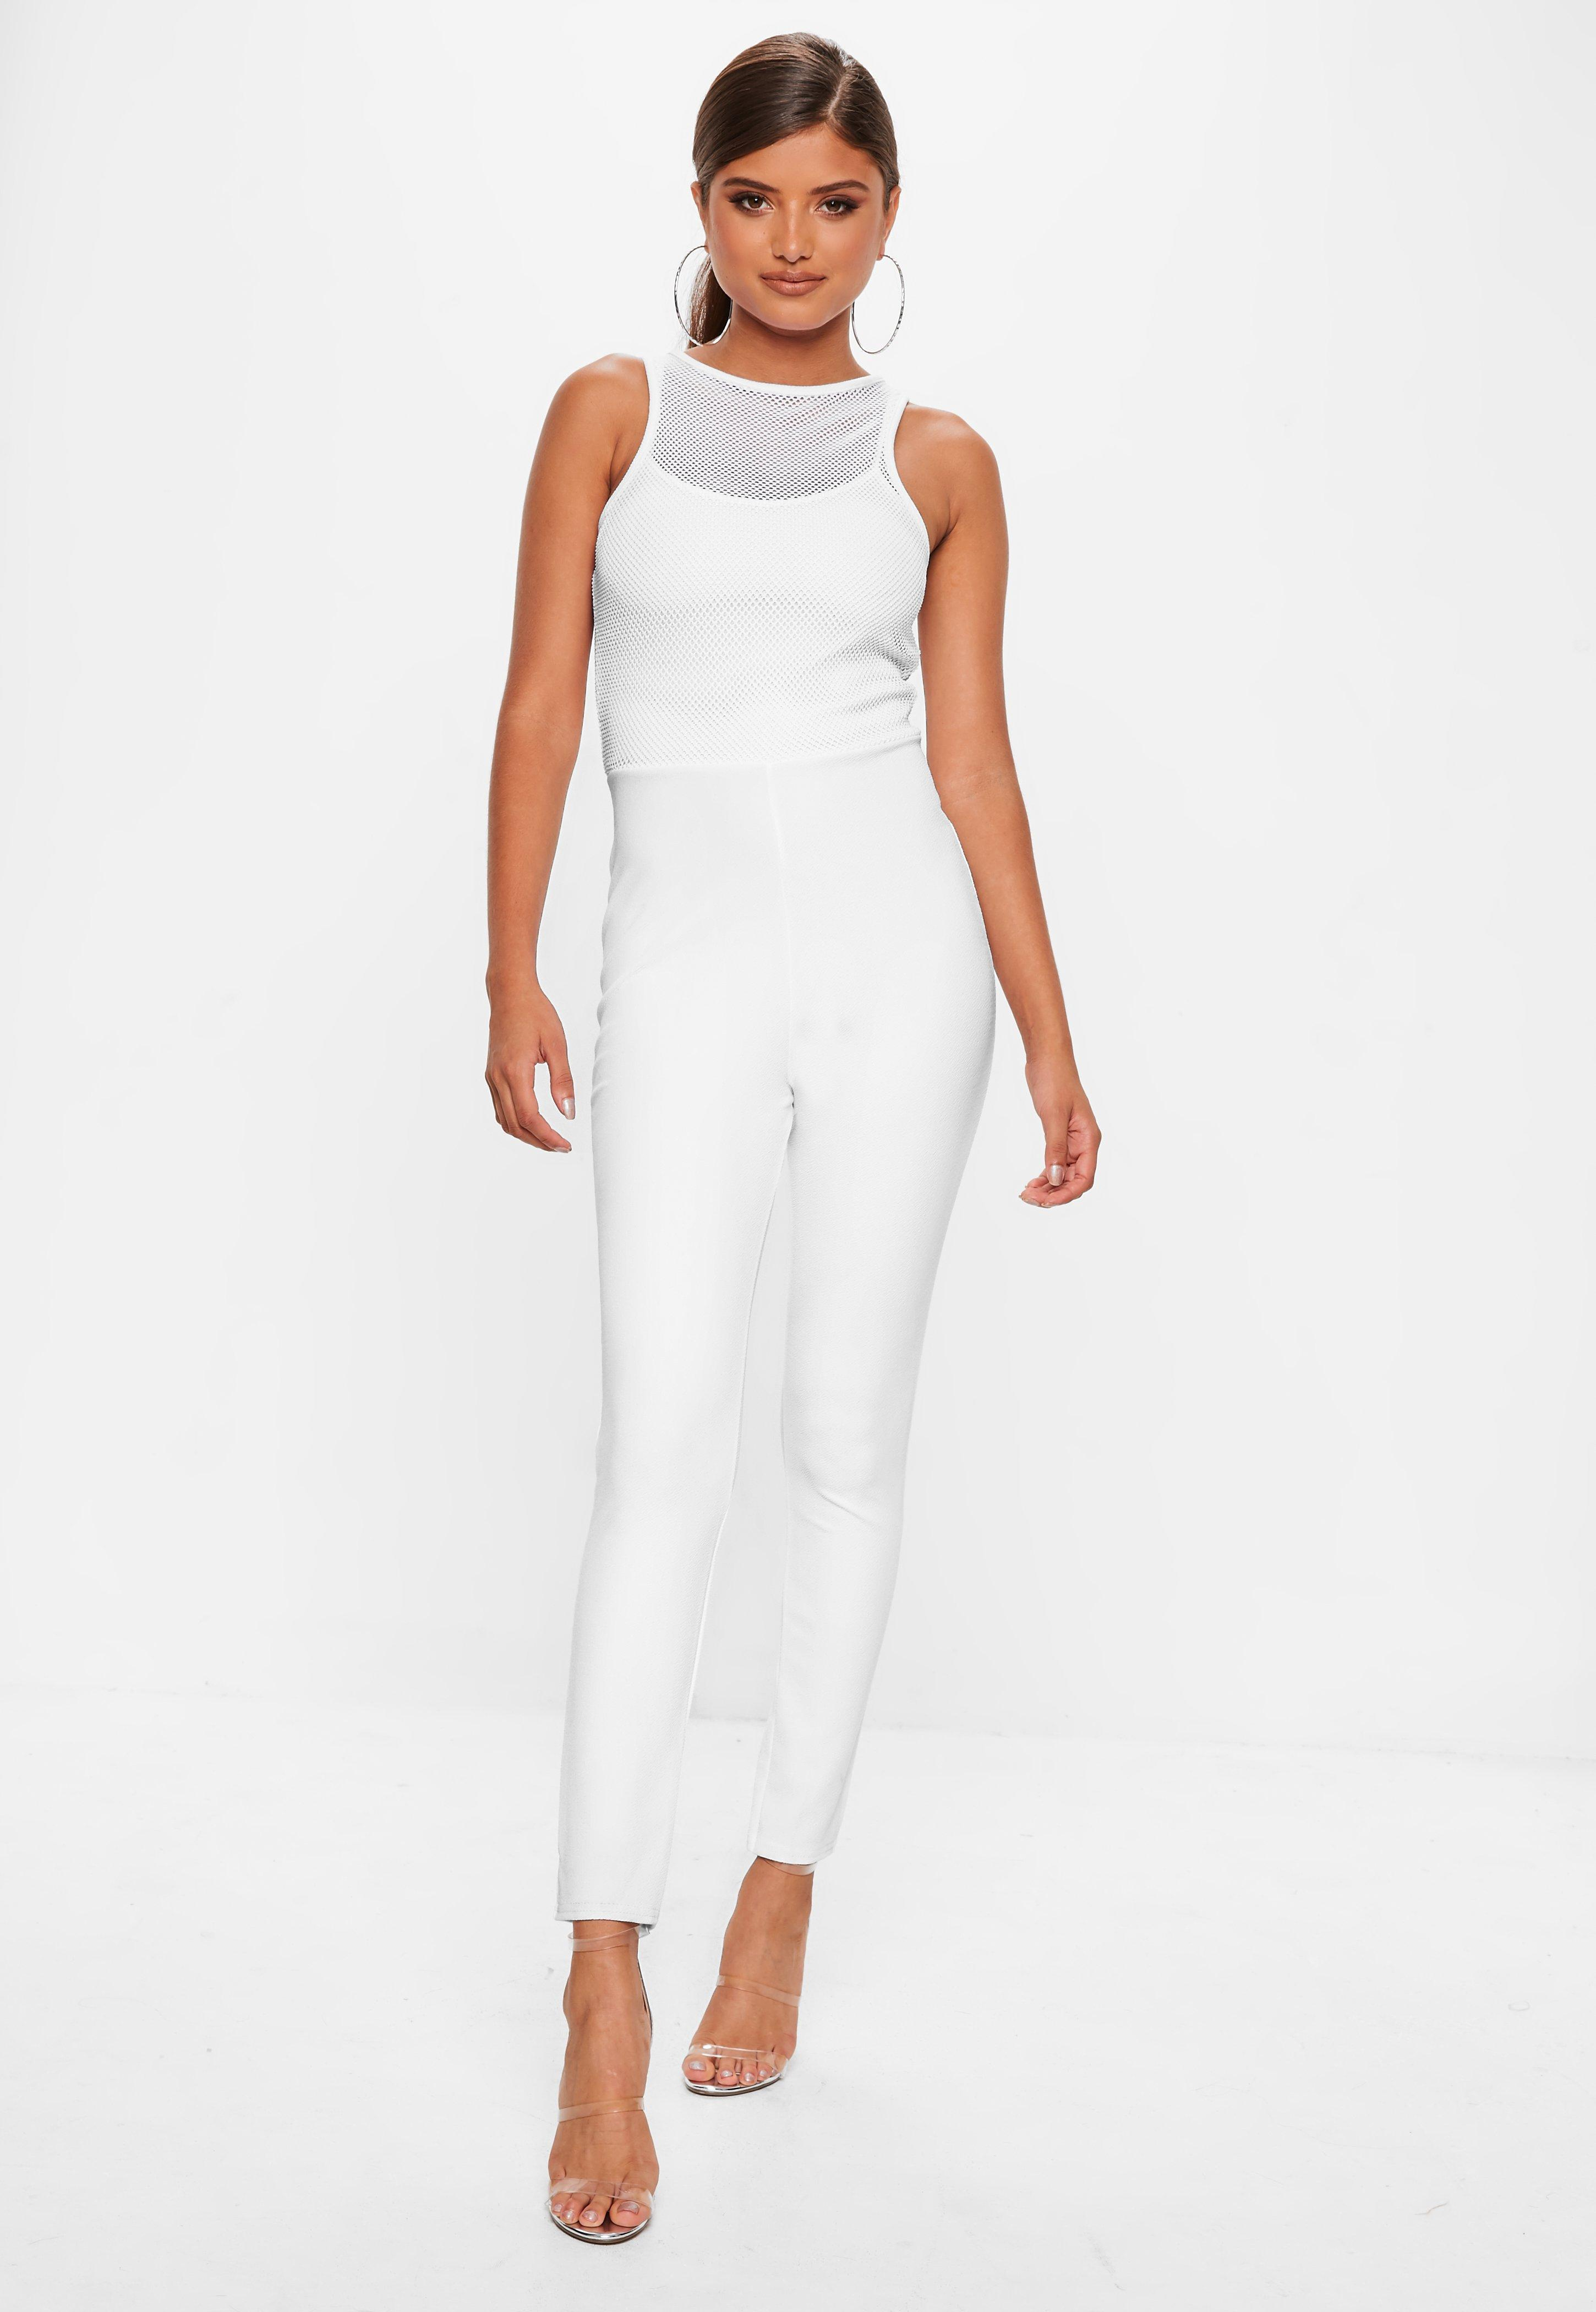 b4fb6ea8e5 Missguided - White Fishnet Top Jumpsuit - Lyst. View fullscreen